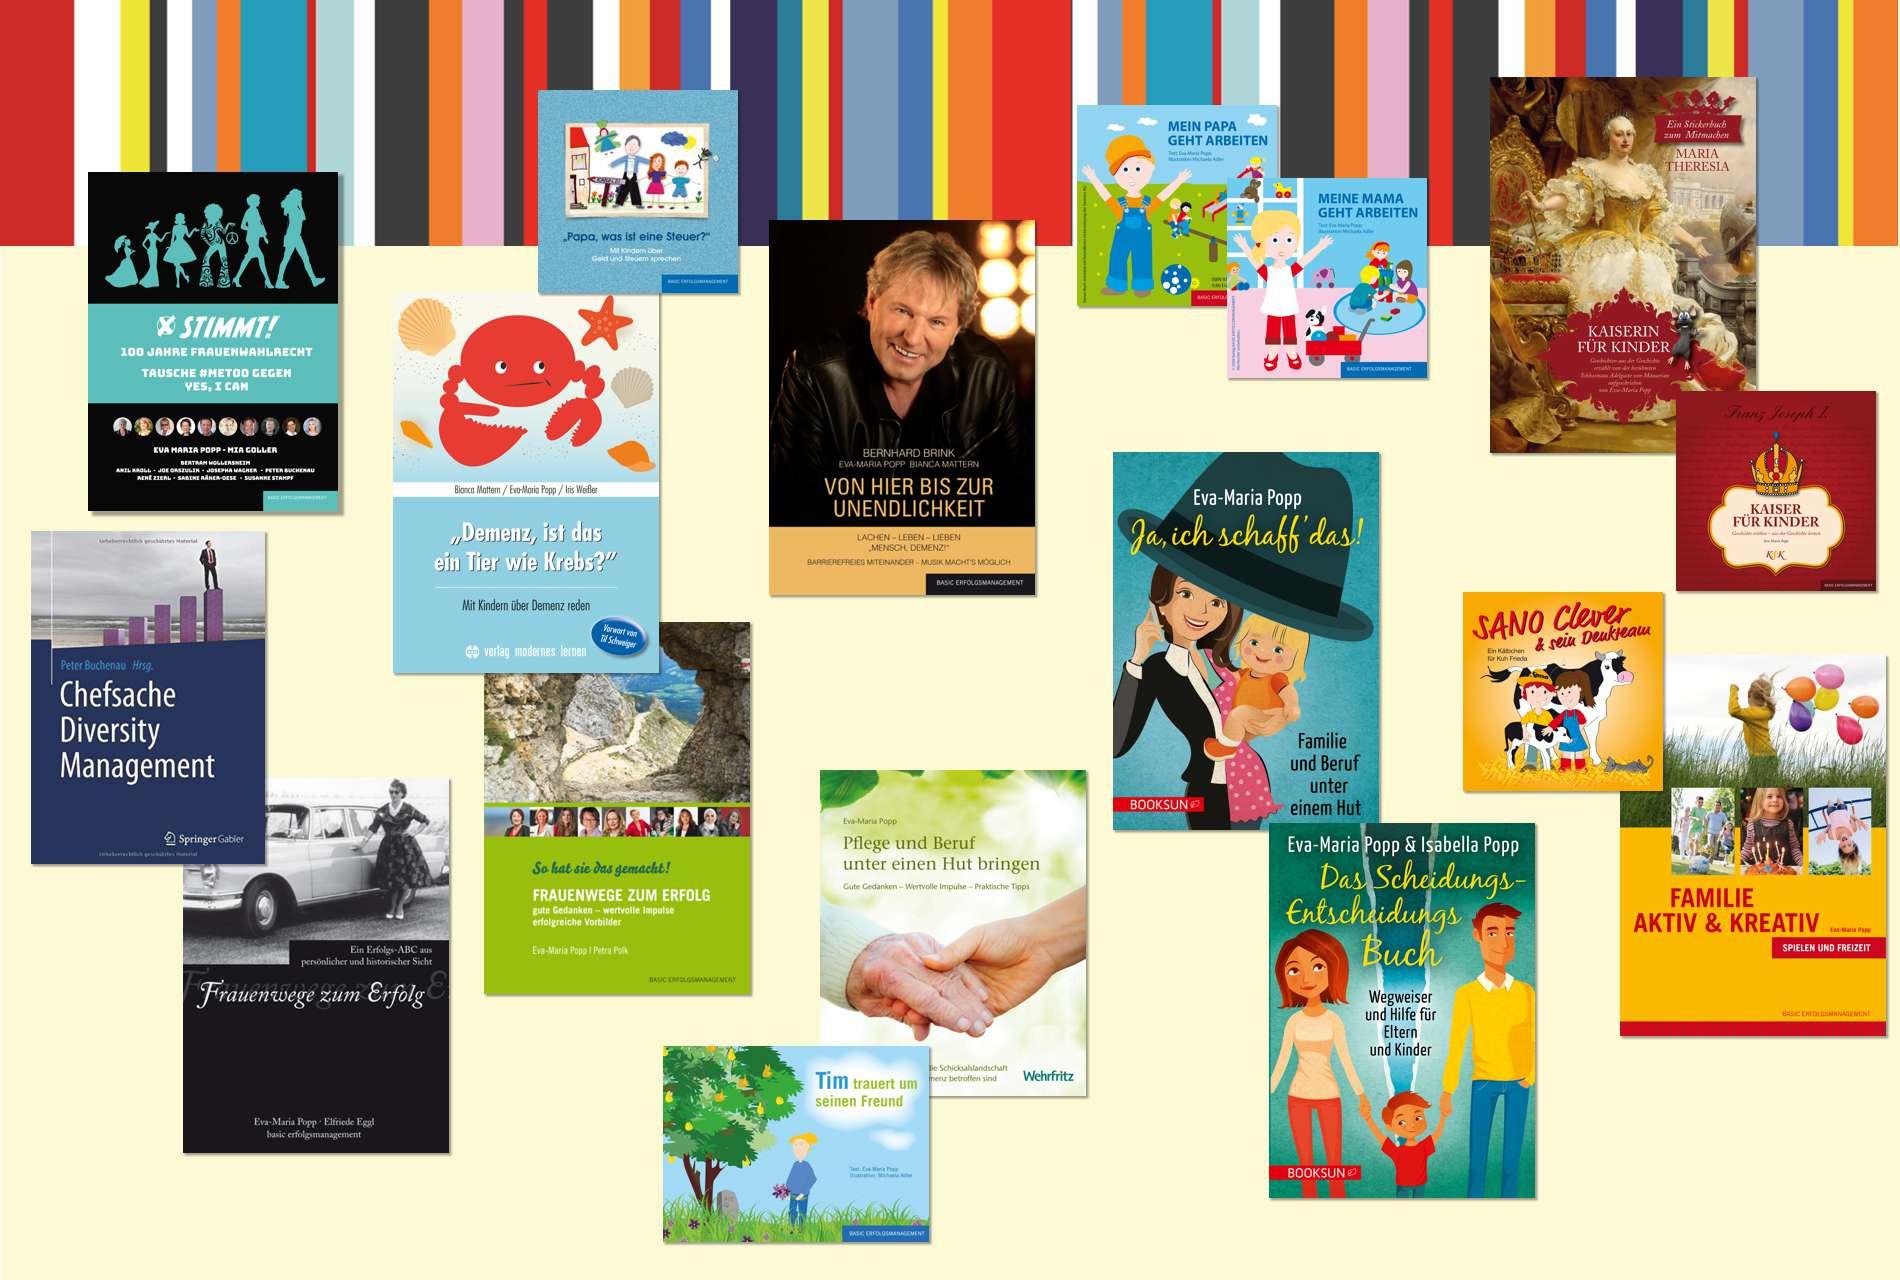 Coporate Publishing, Buch-Kooperationen, Buch-Coaching, Ghost-Writing, Sponsoring